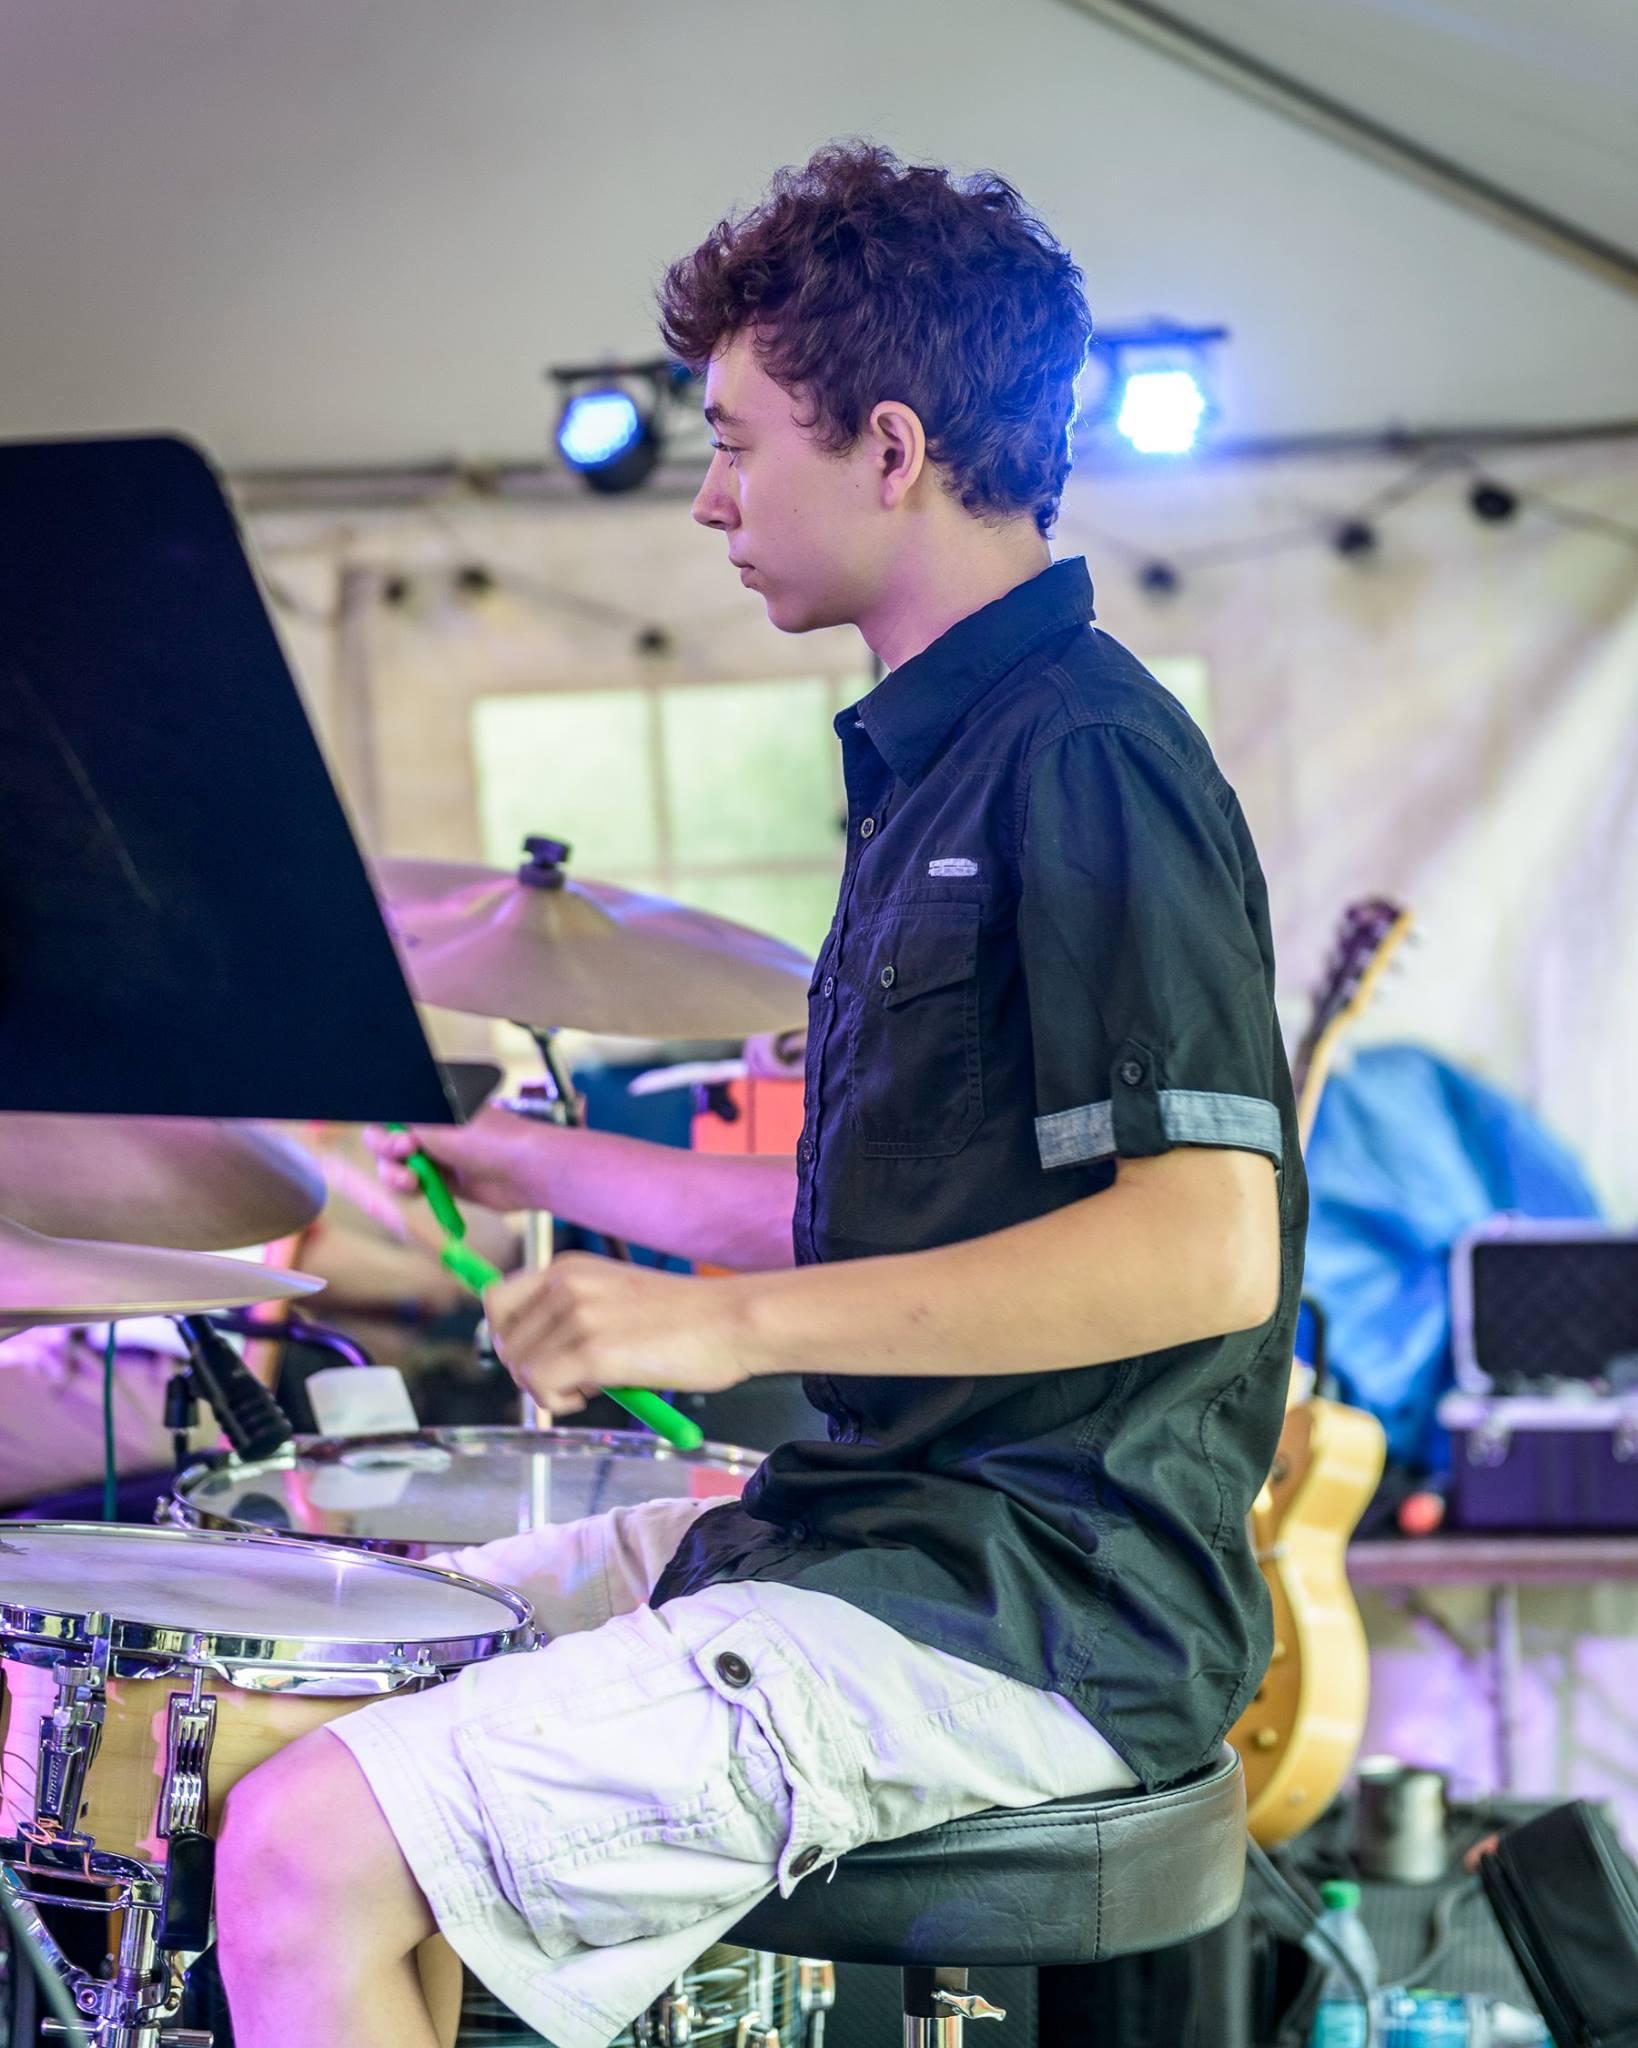 Ruben at the 2017 Lobster Festival. Photo credit: Tim Sullivan